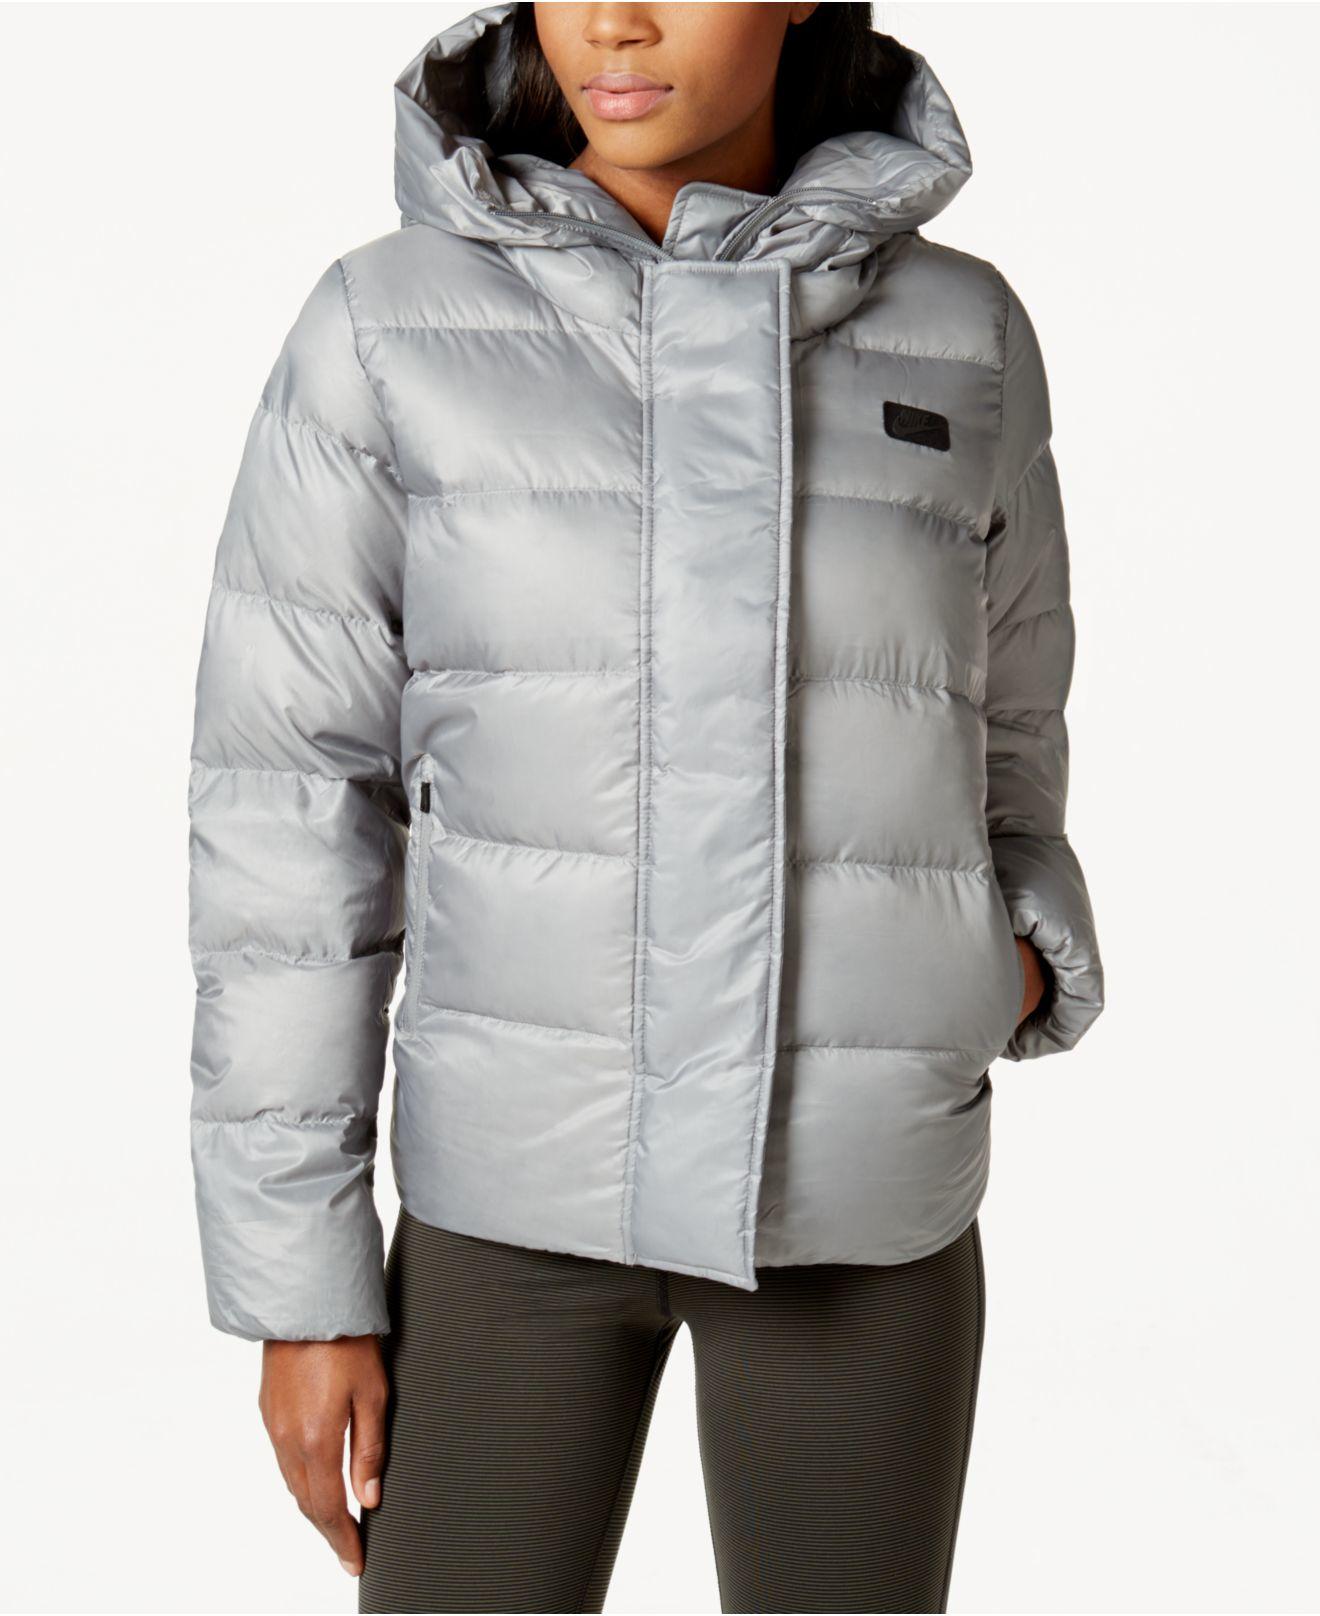 Womens Nike Uptown 550 Down Tumbled Grey/Black Jacket